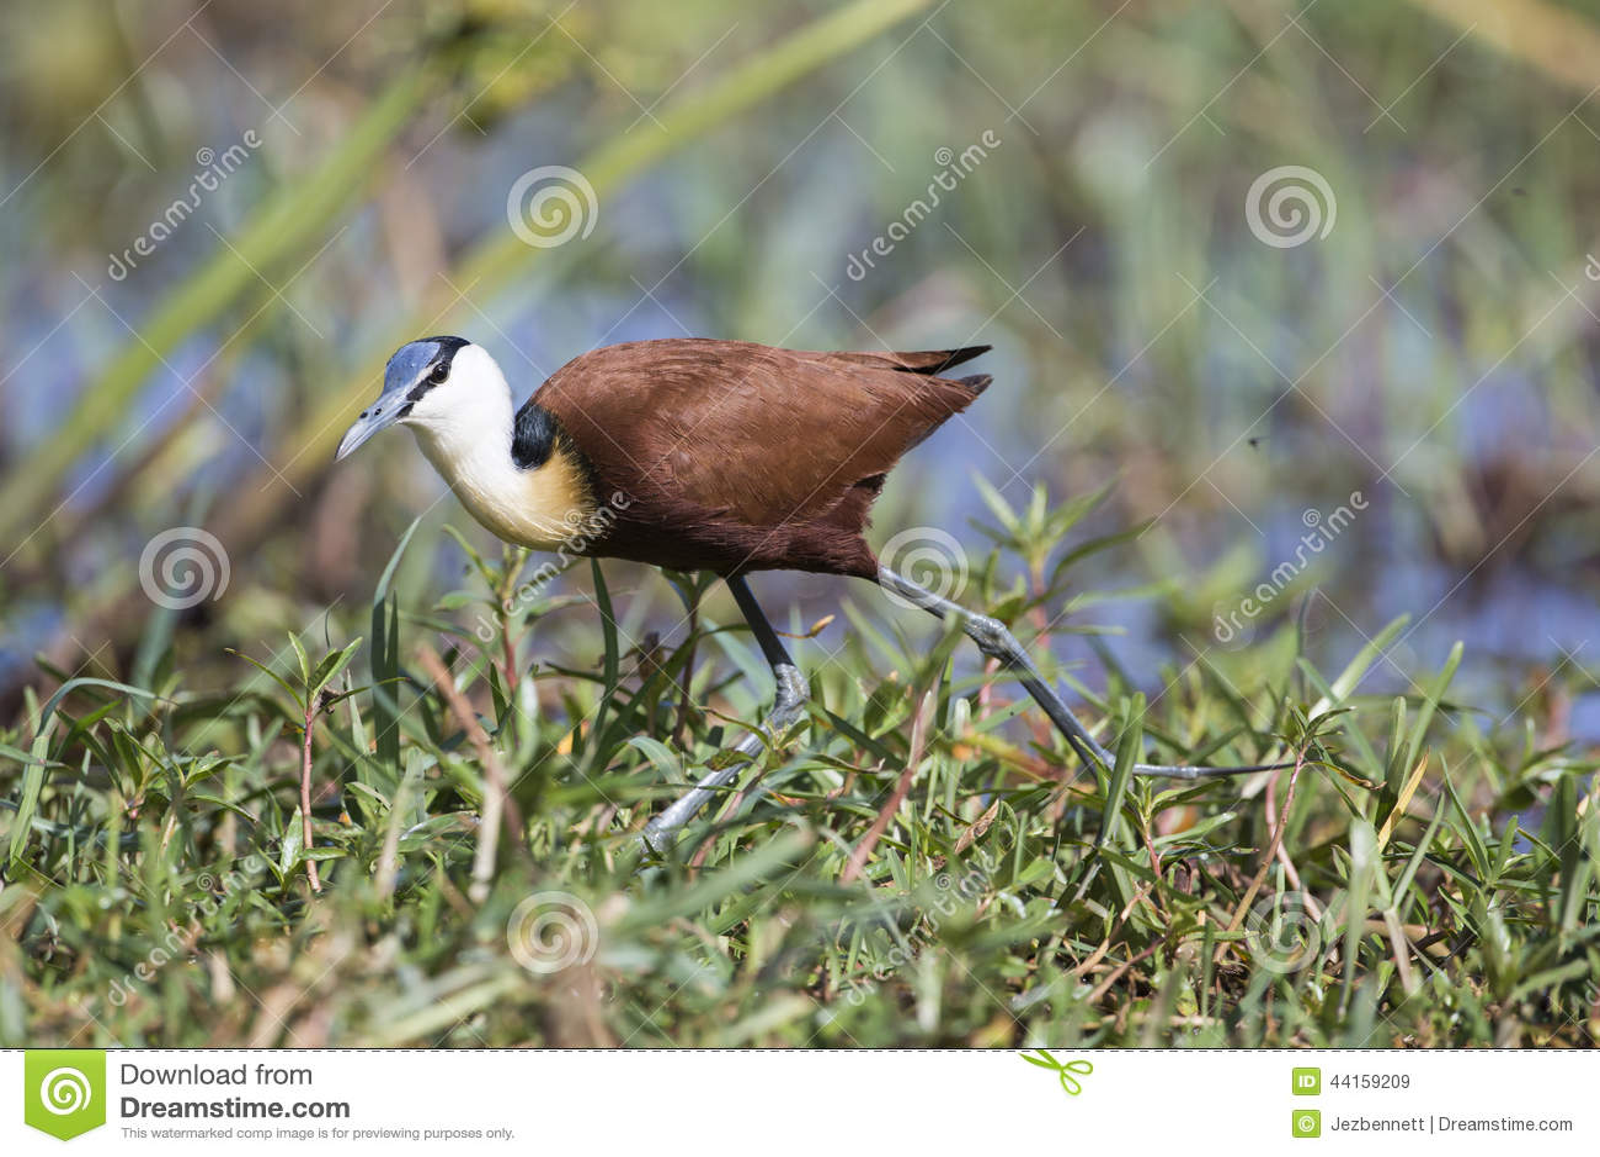 African Jacana (Actophilornis africanus) walking